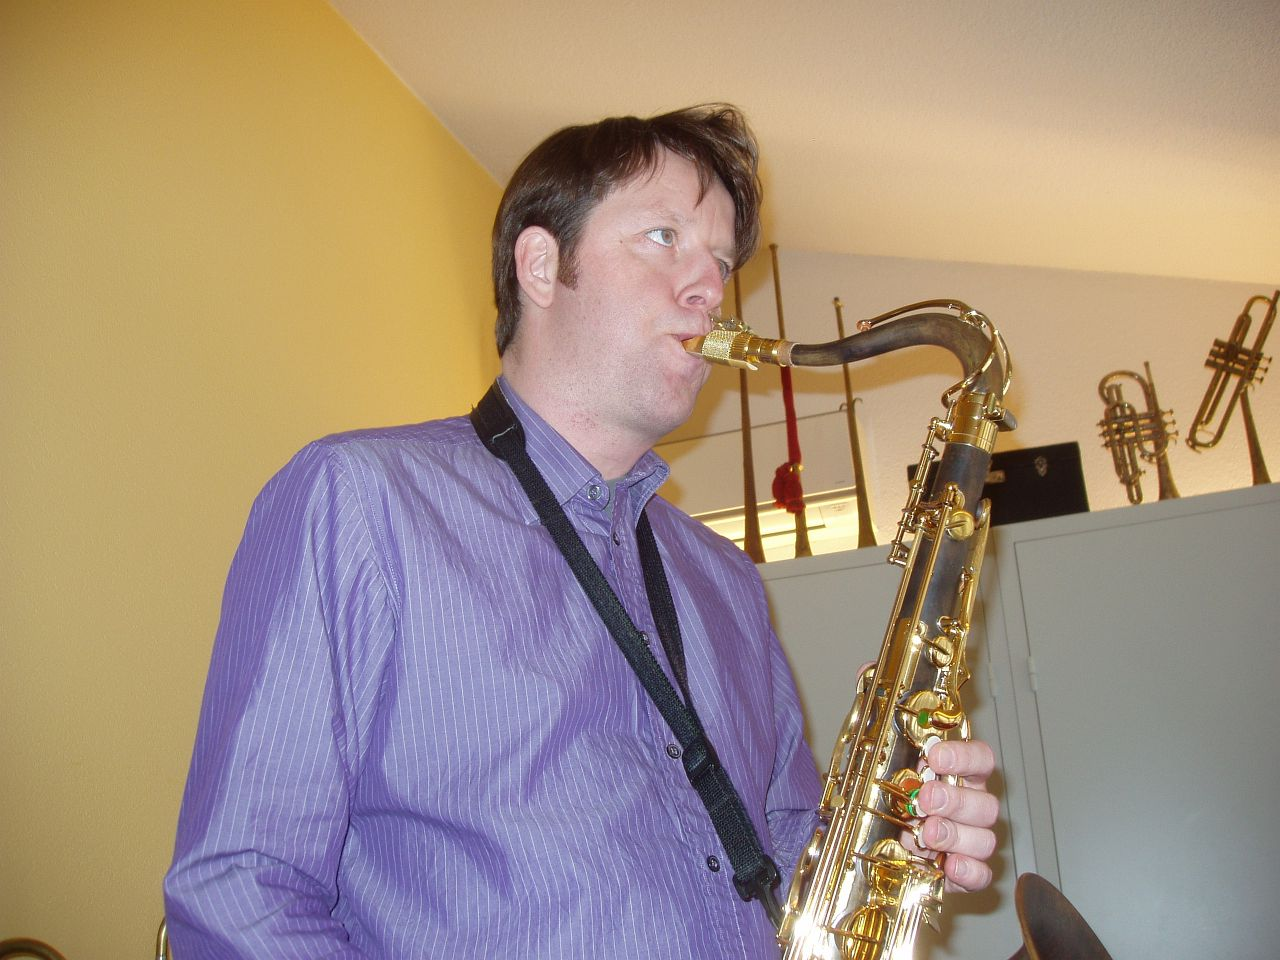 Musiker 099